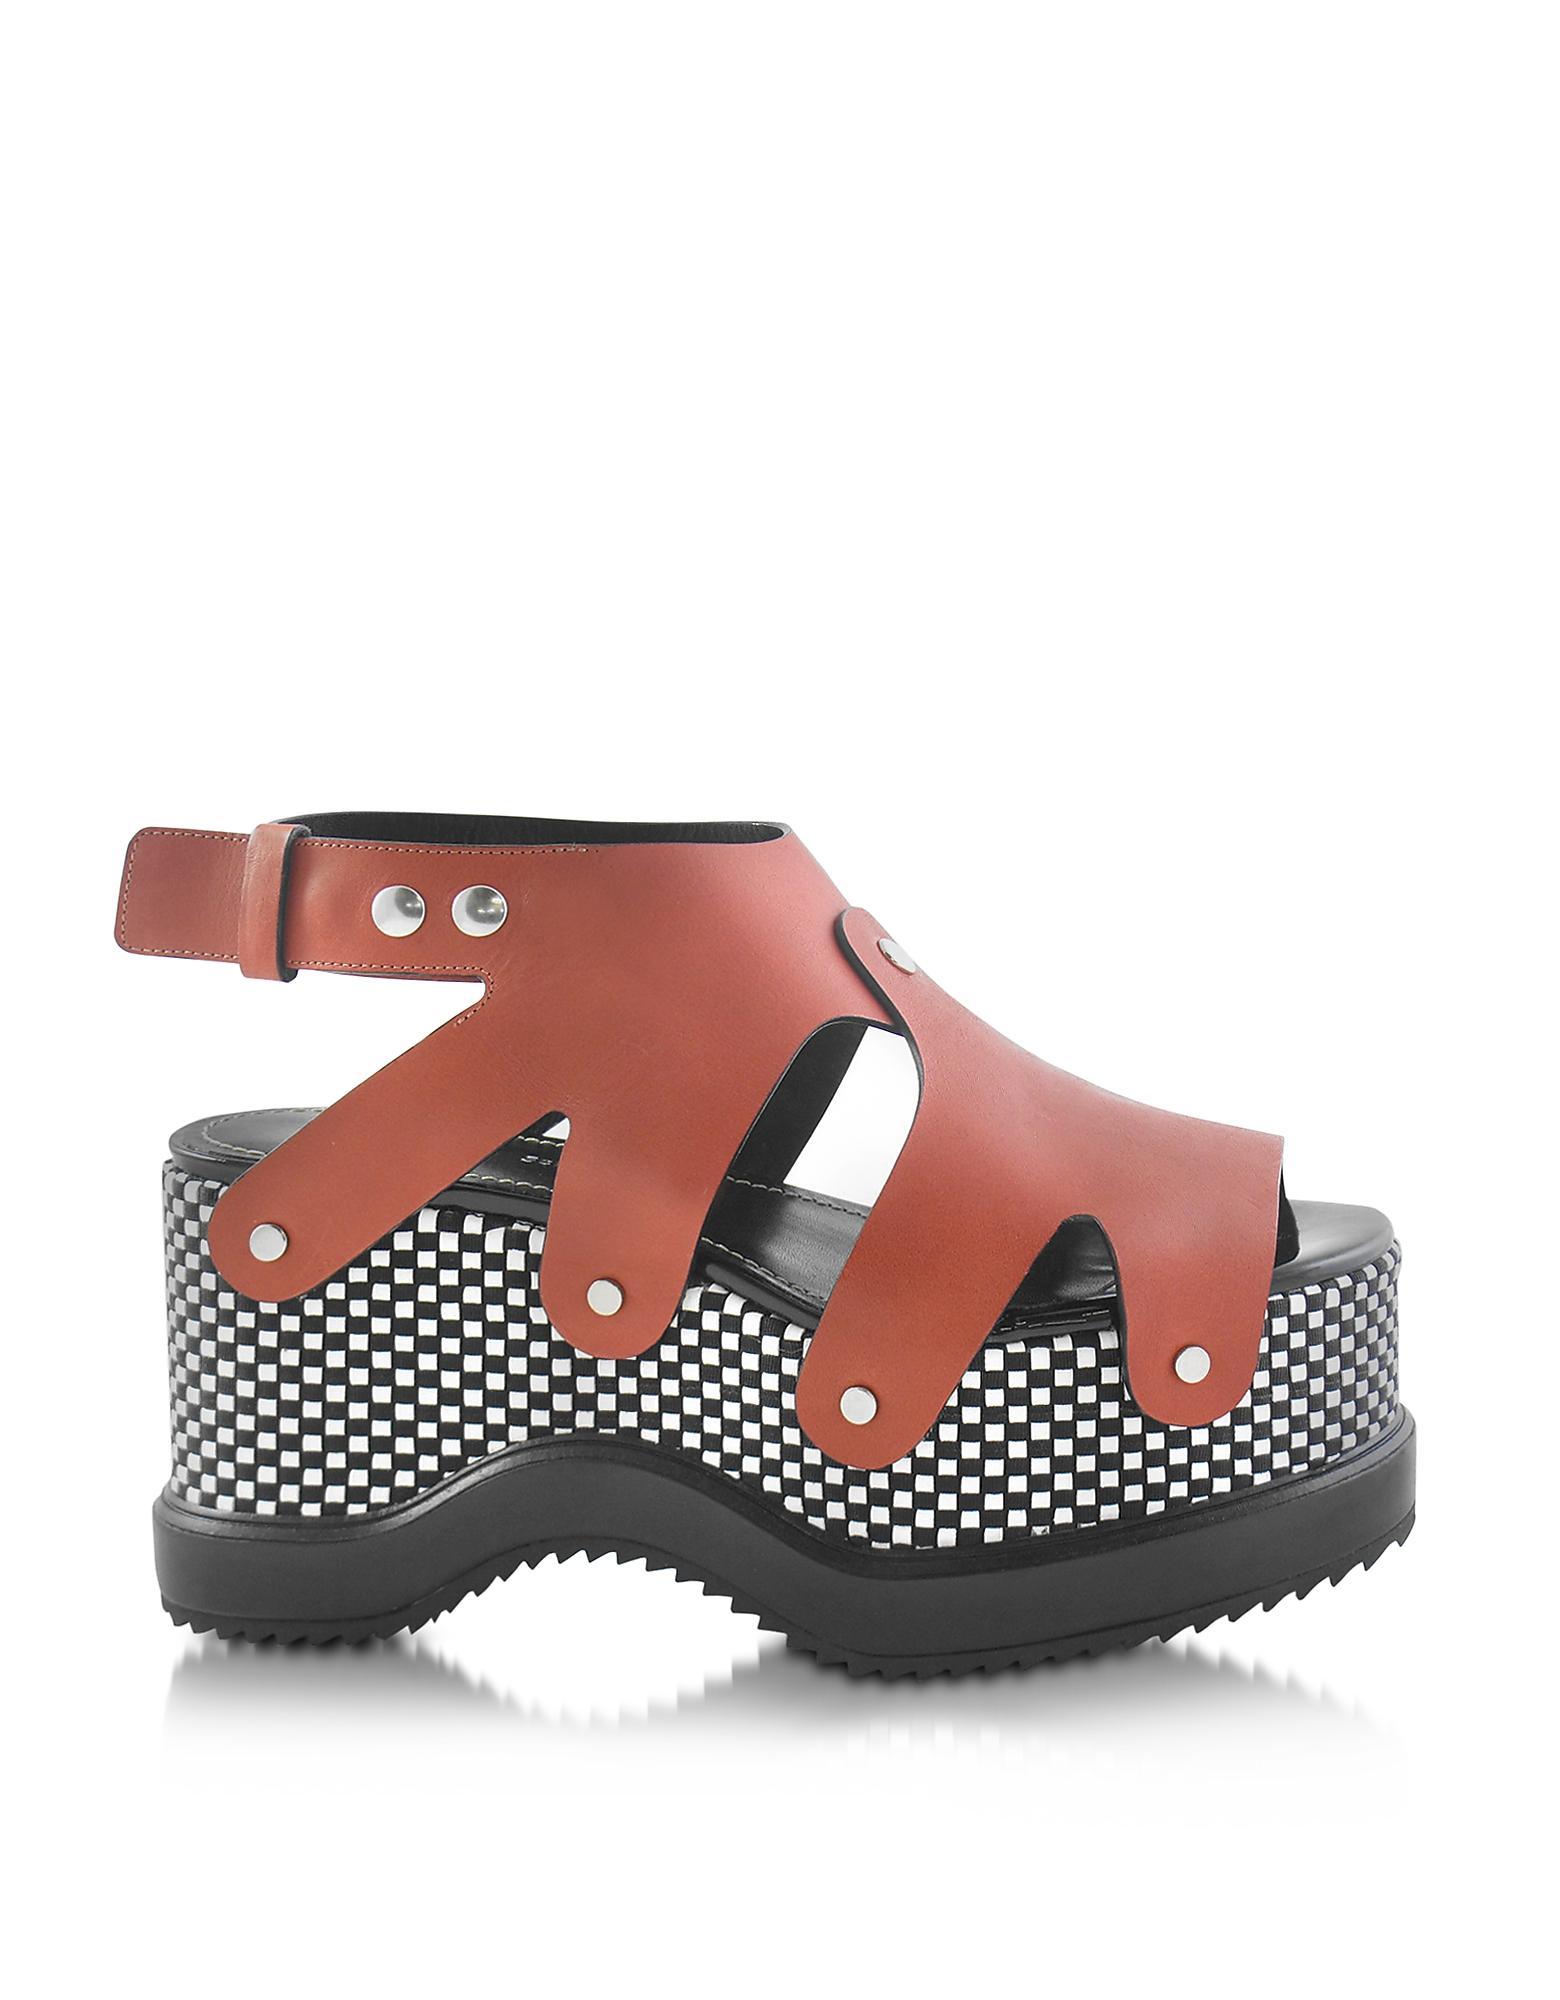 Proenza Schouler Shoes, Nappa Leather Sandal w/Optical Print Wedge